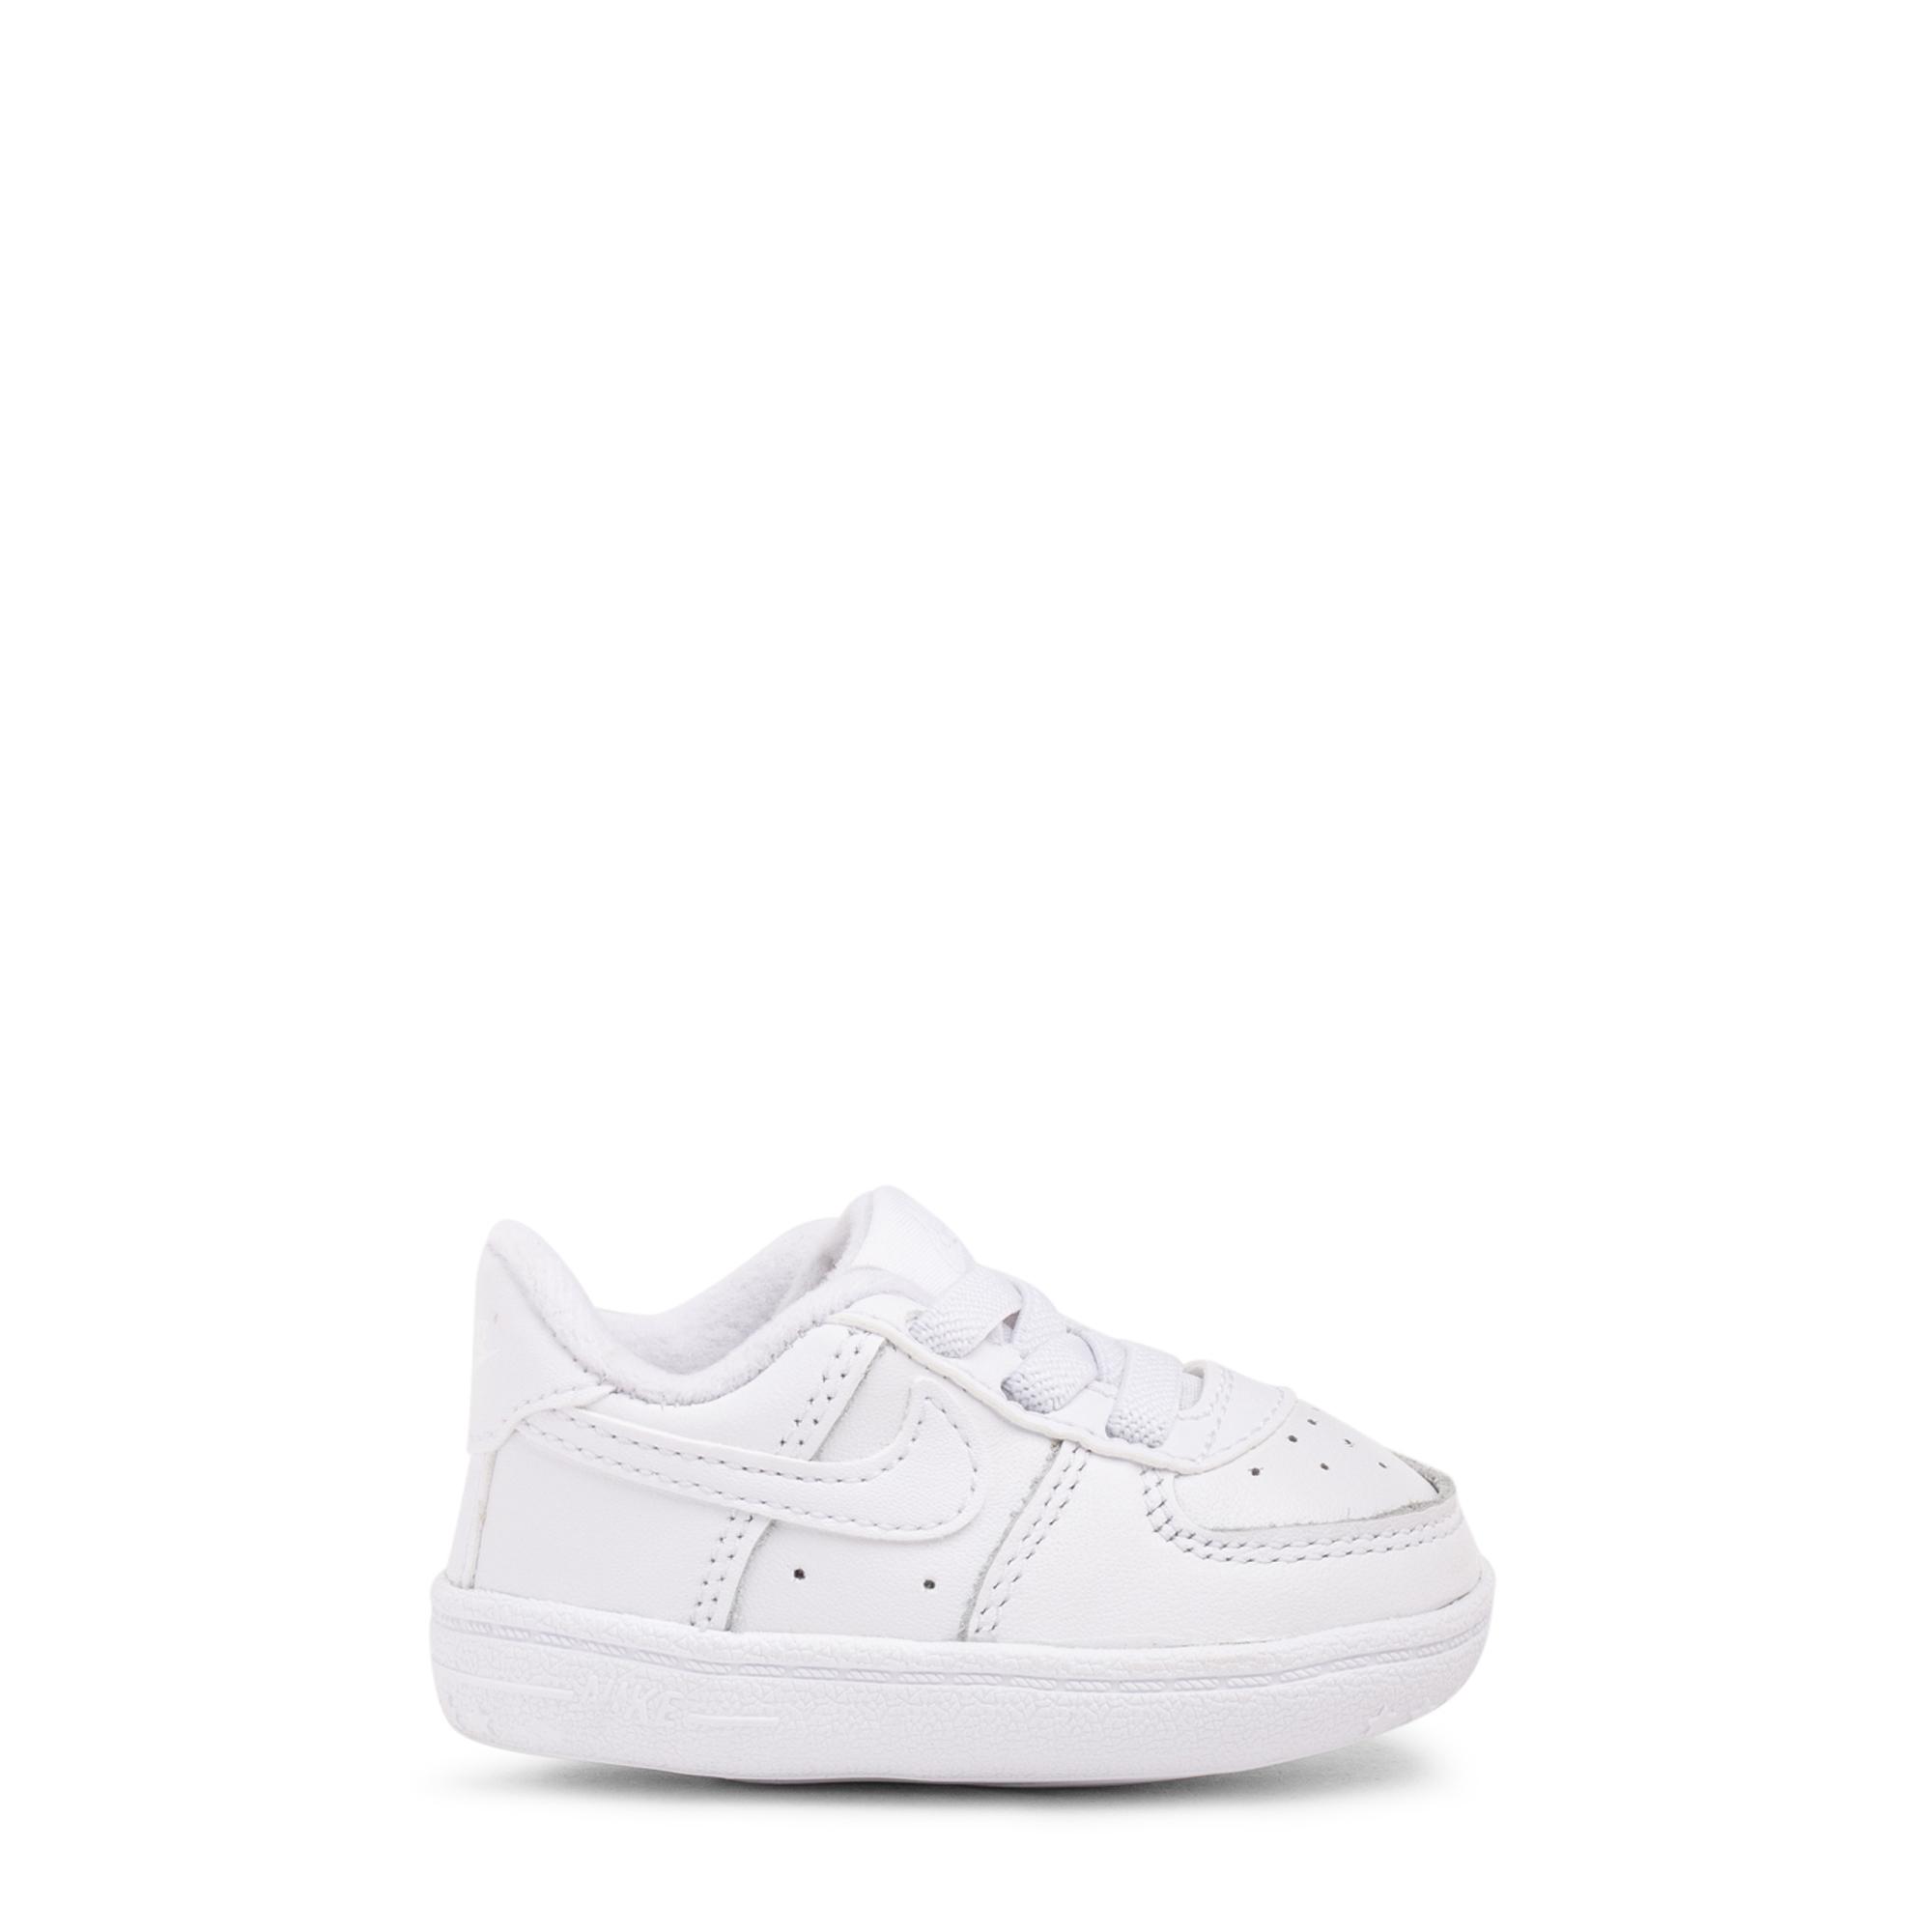 Air Force 1 Crib sneakers